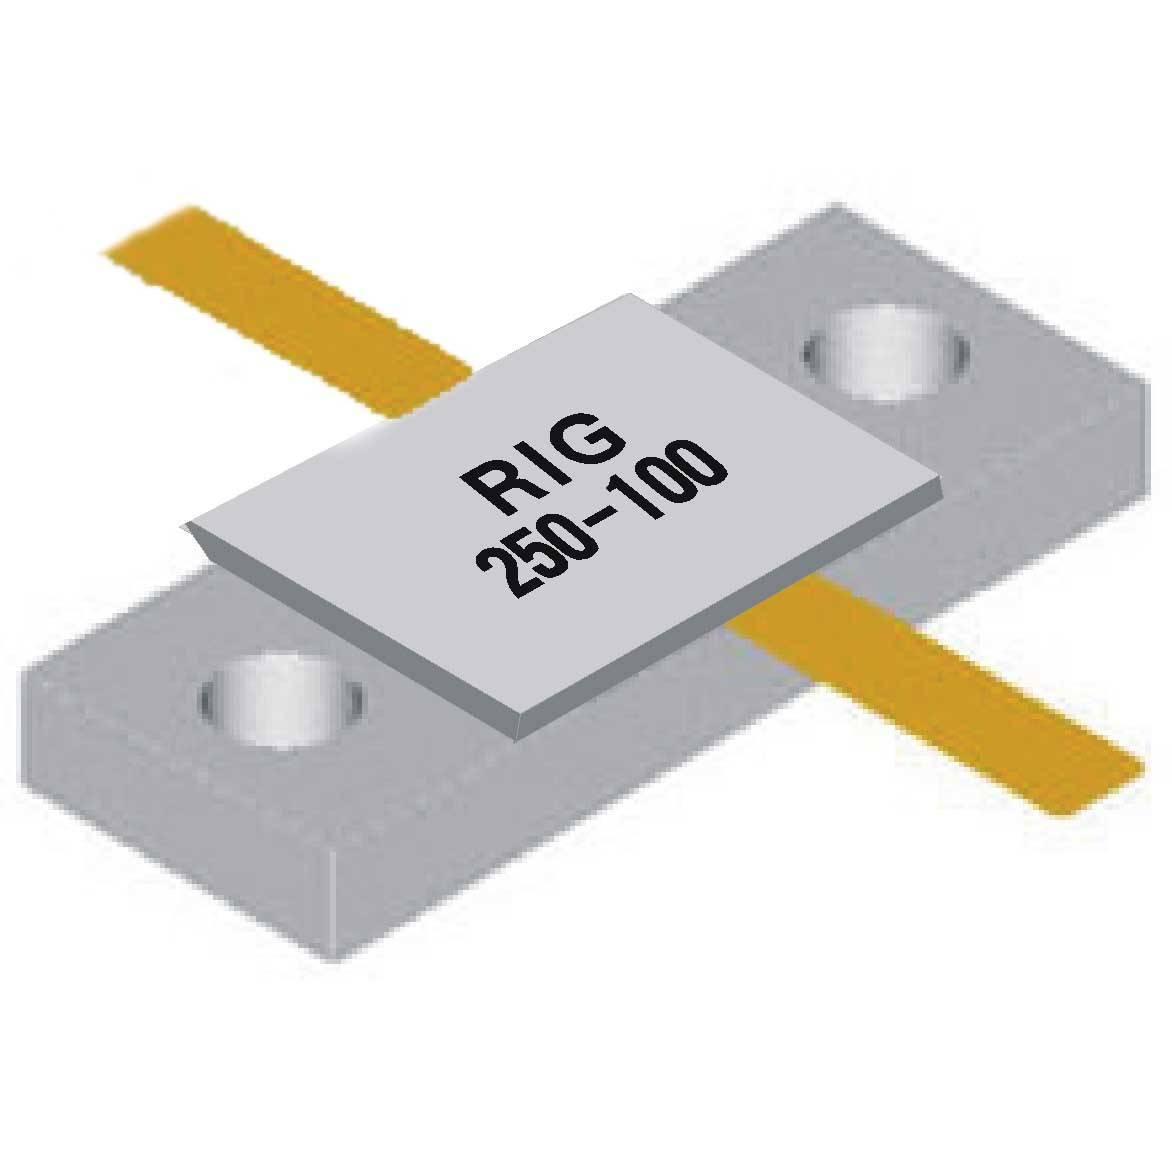 Rf resistors and high-power microstrip resistor (RIG02 250W - 100 European)